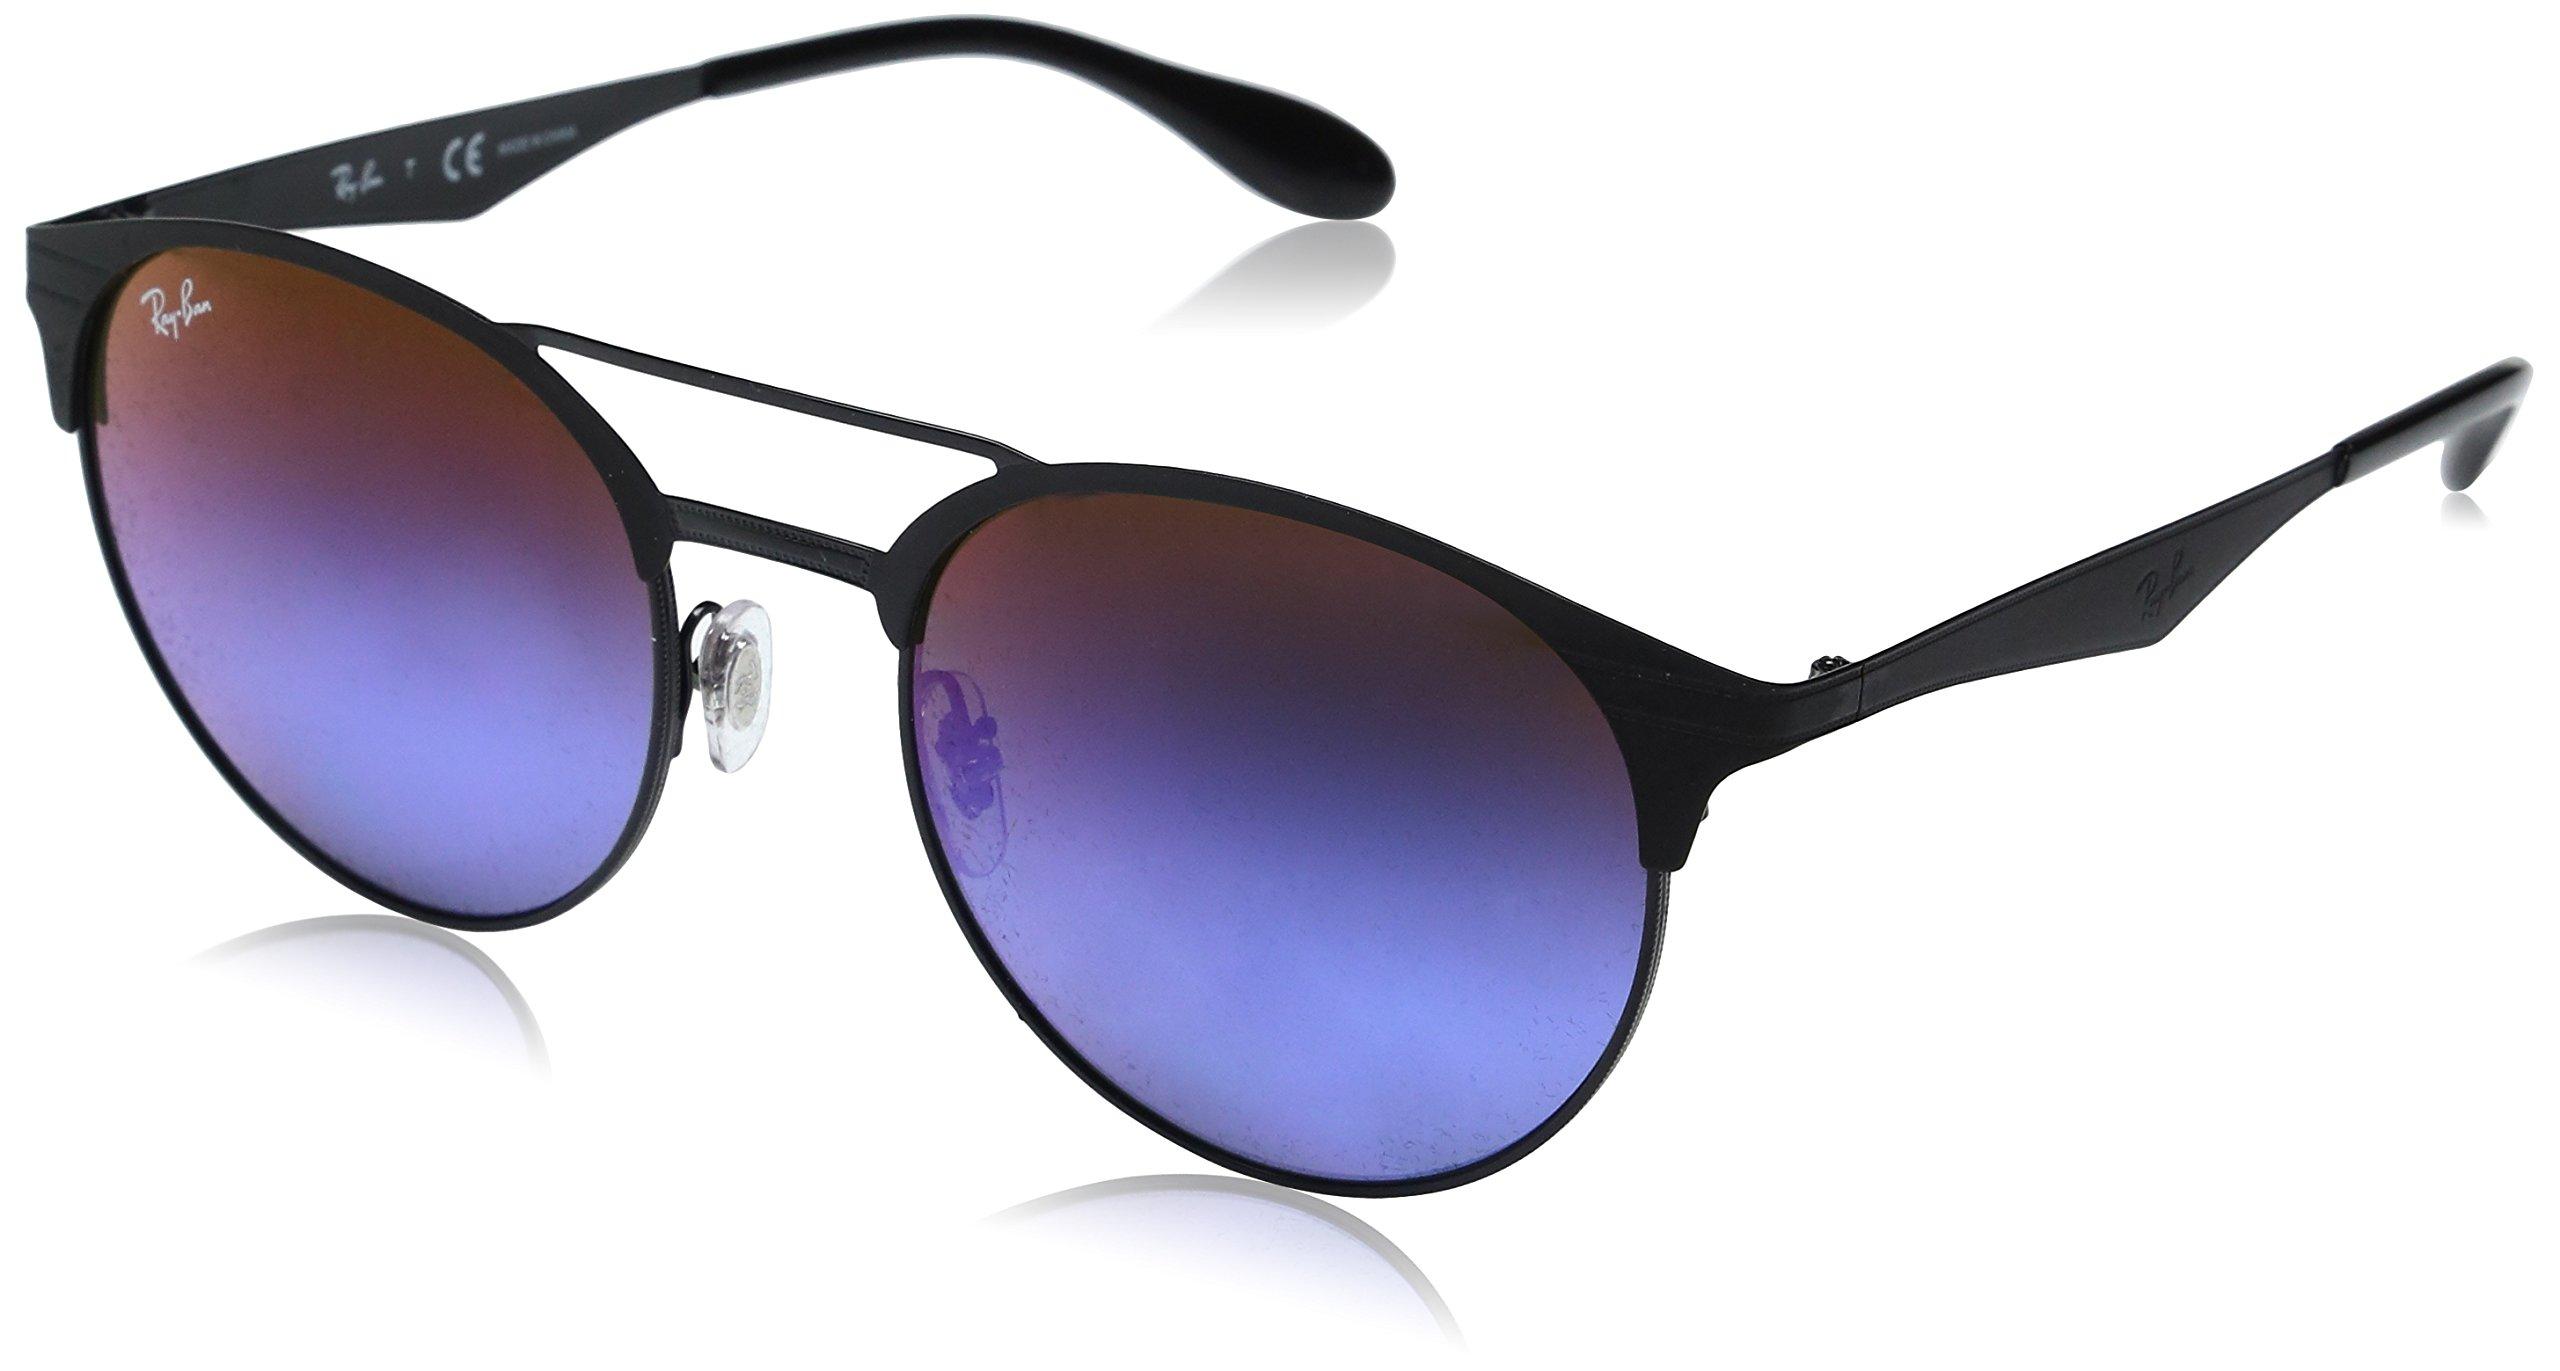 Ray-Ban Metal Unisex Round Sunglasses, Gold/Top Havana, 54 mm